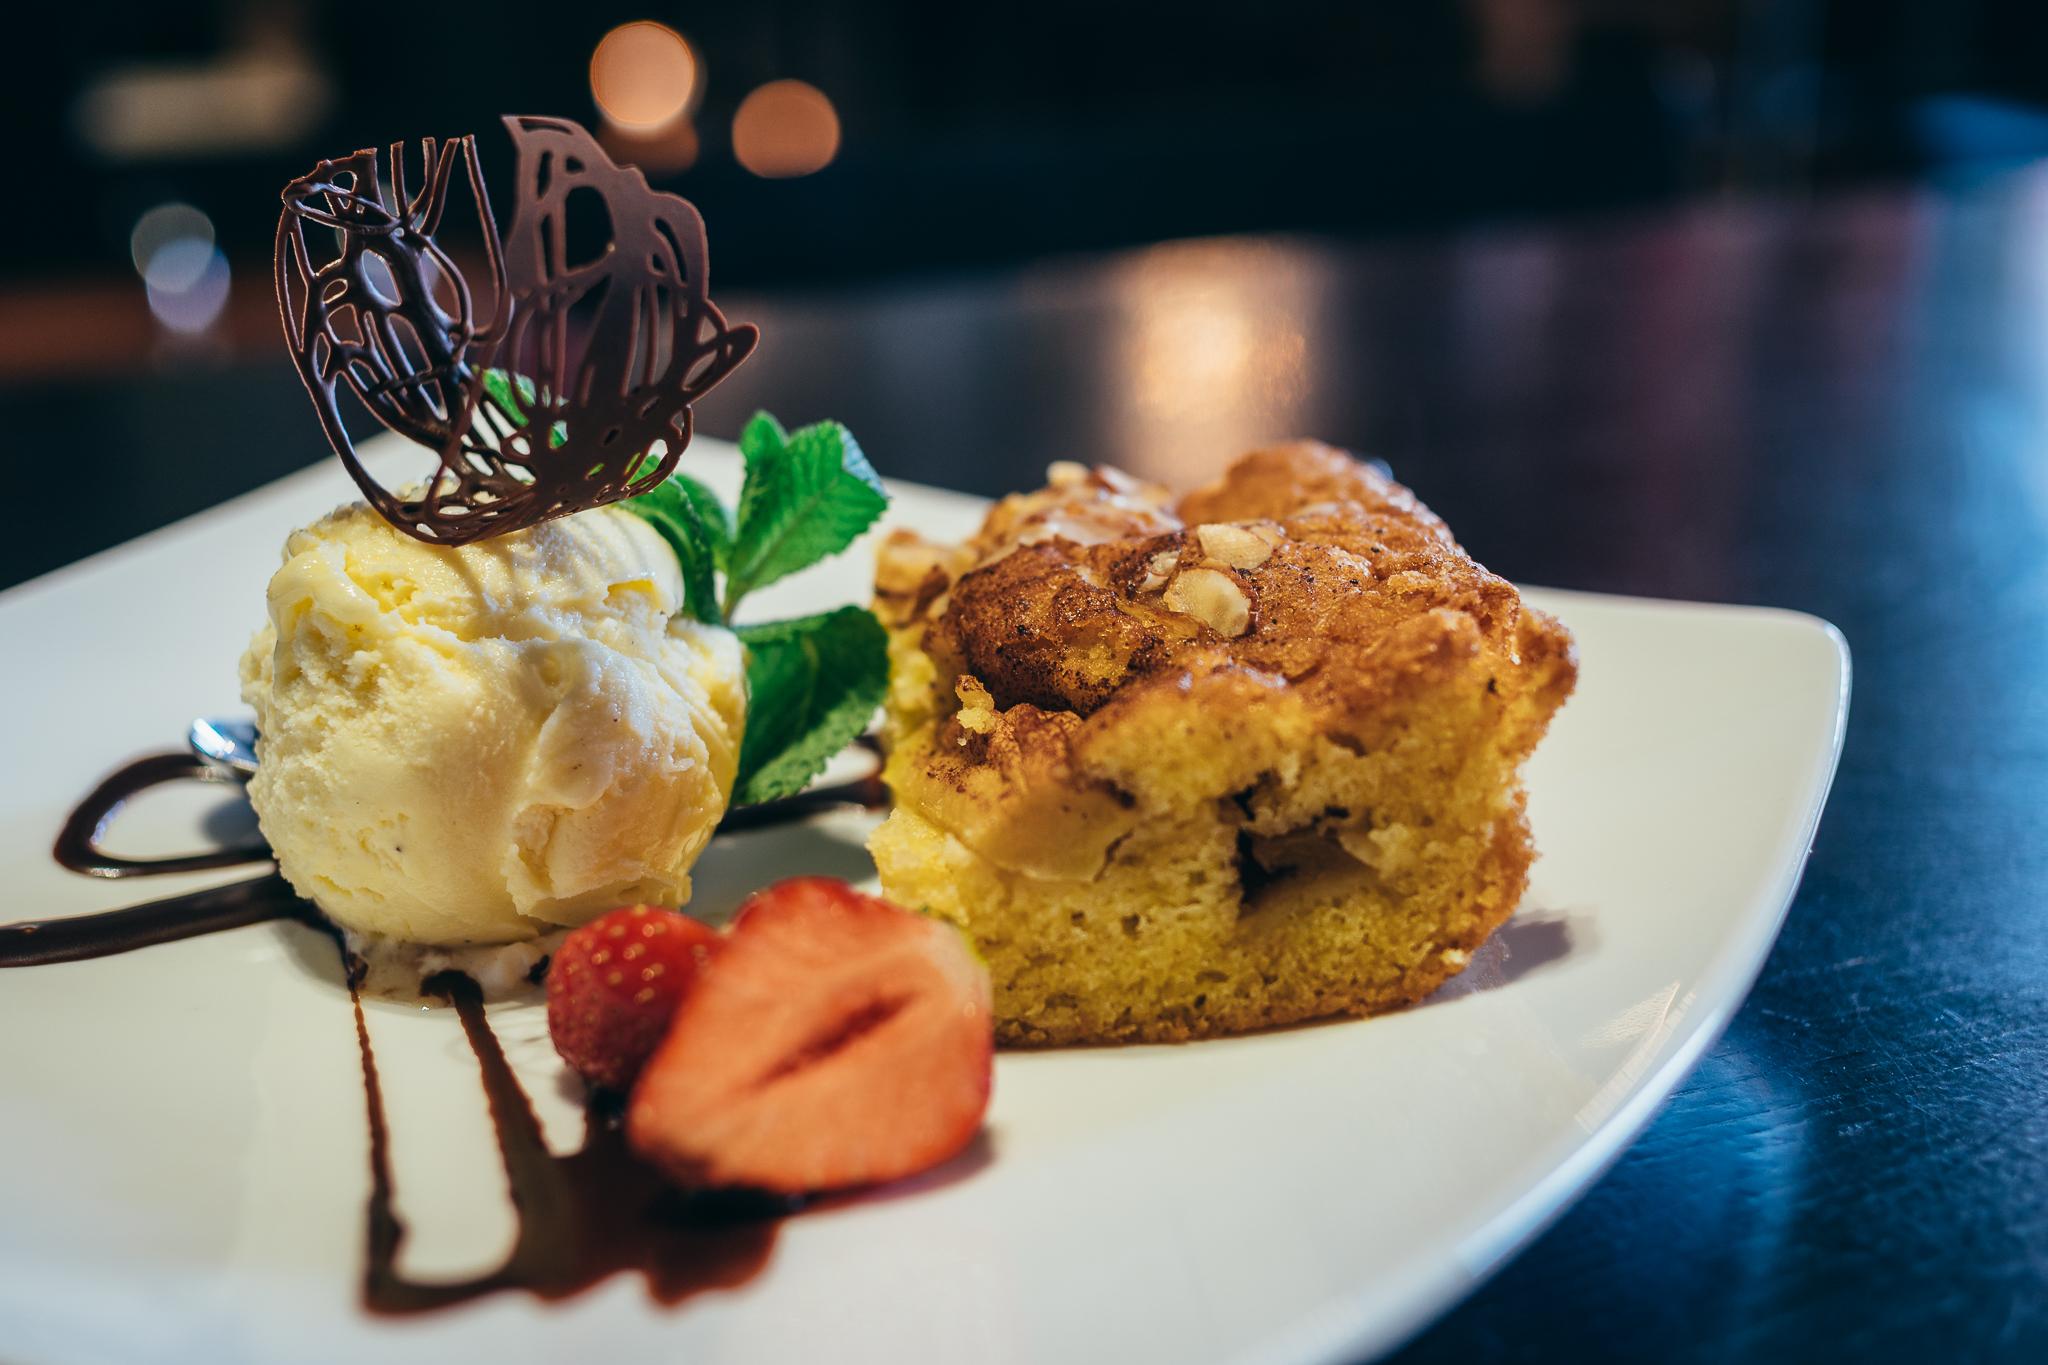 Apple Pie and Vanilla Ice Cream